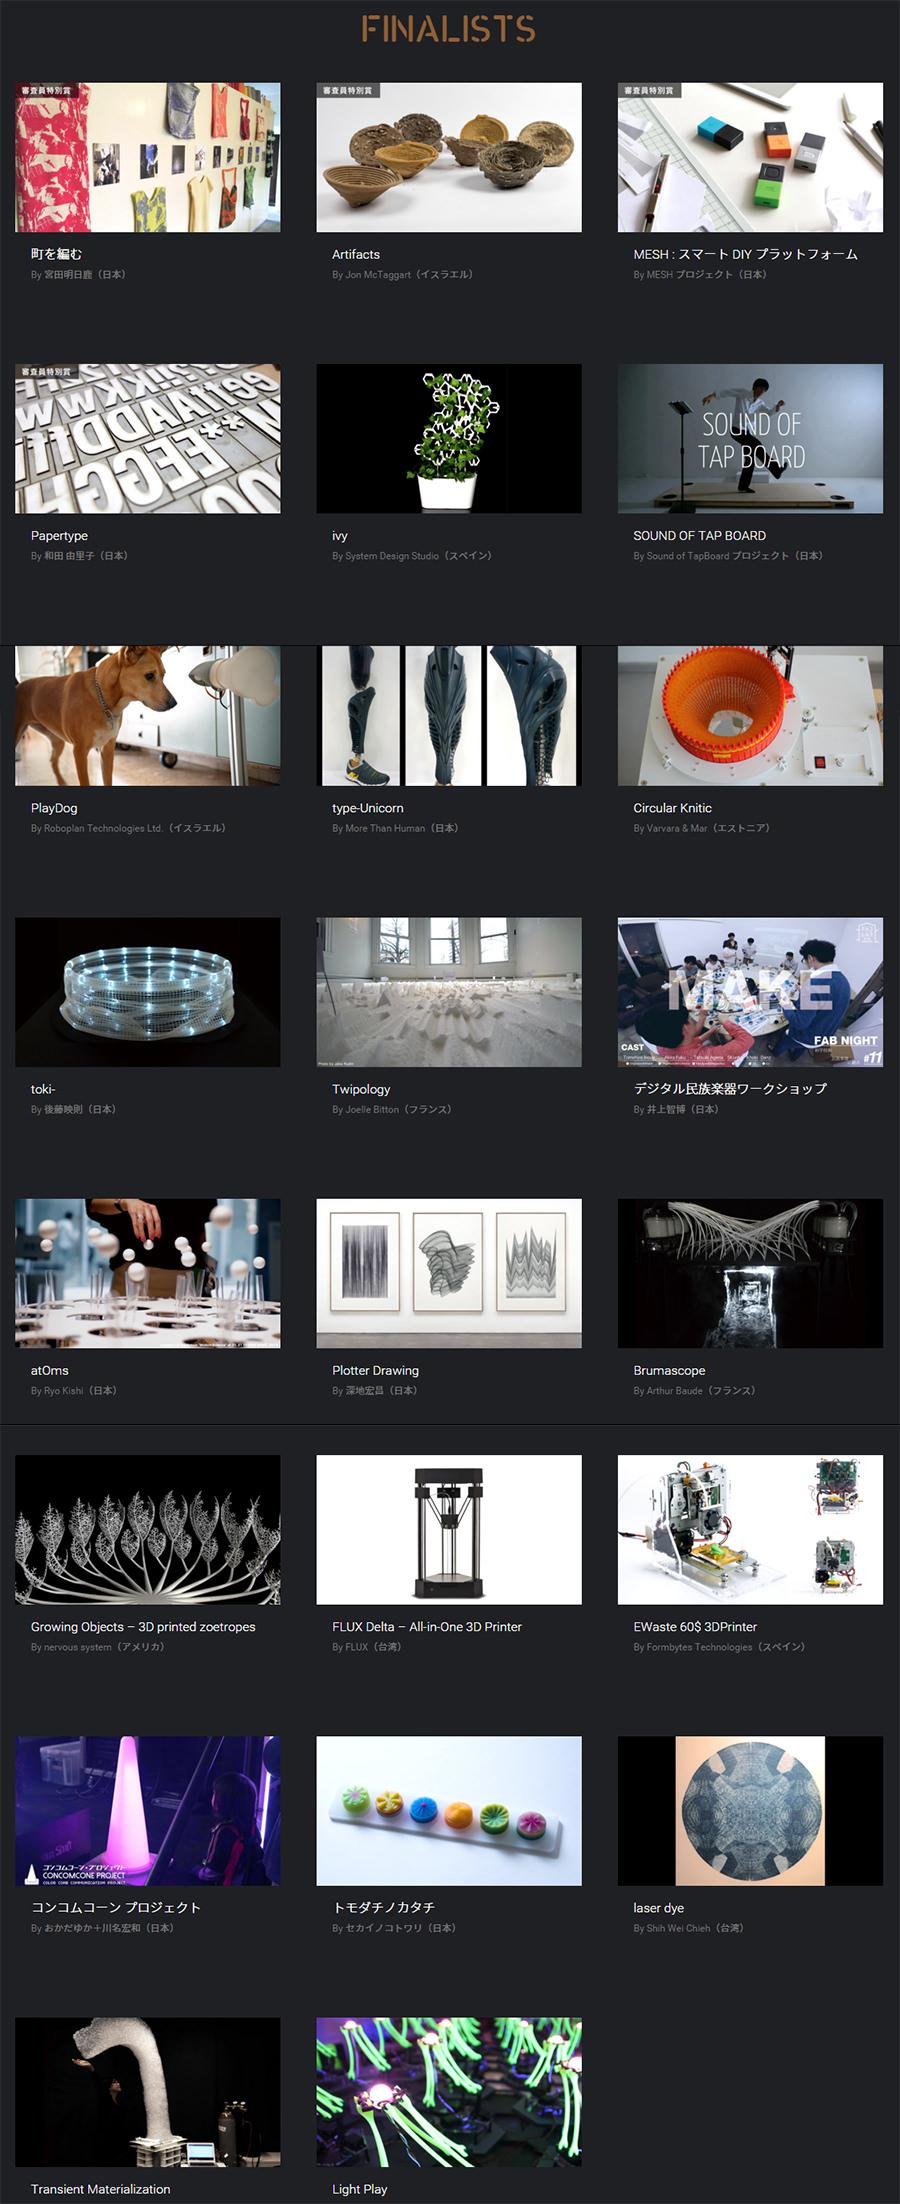 YouFab-Global-Creative-Awards-2015-3